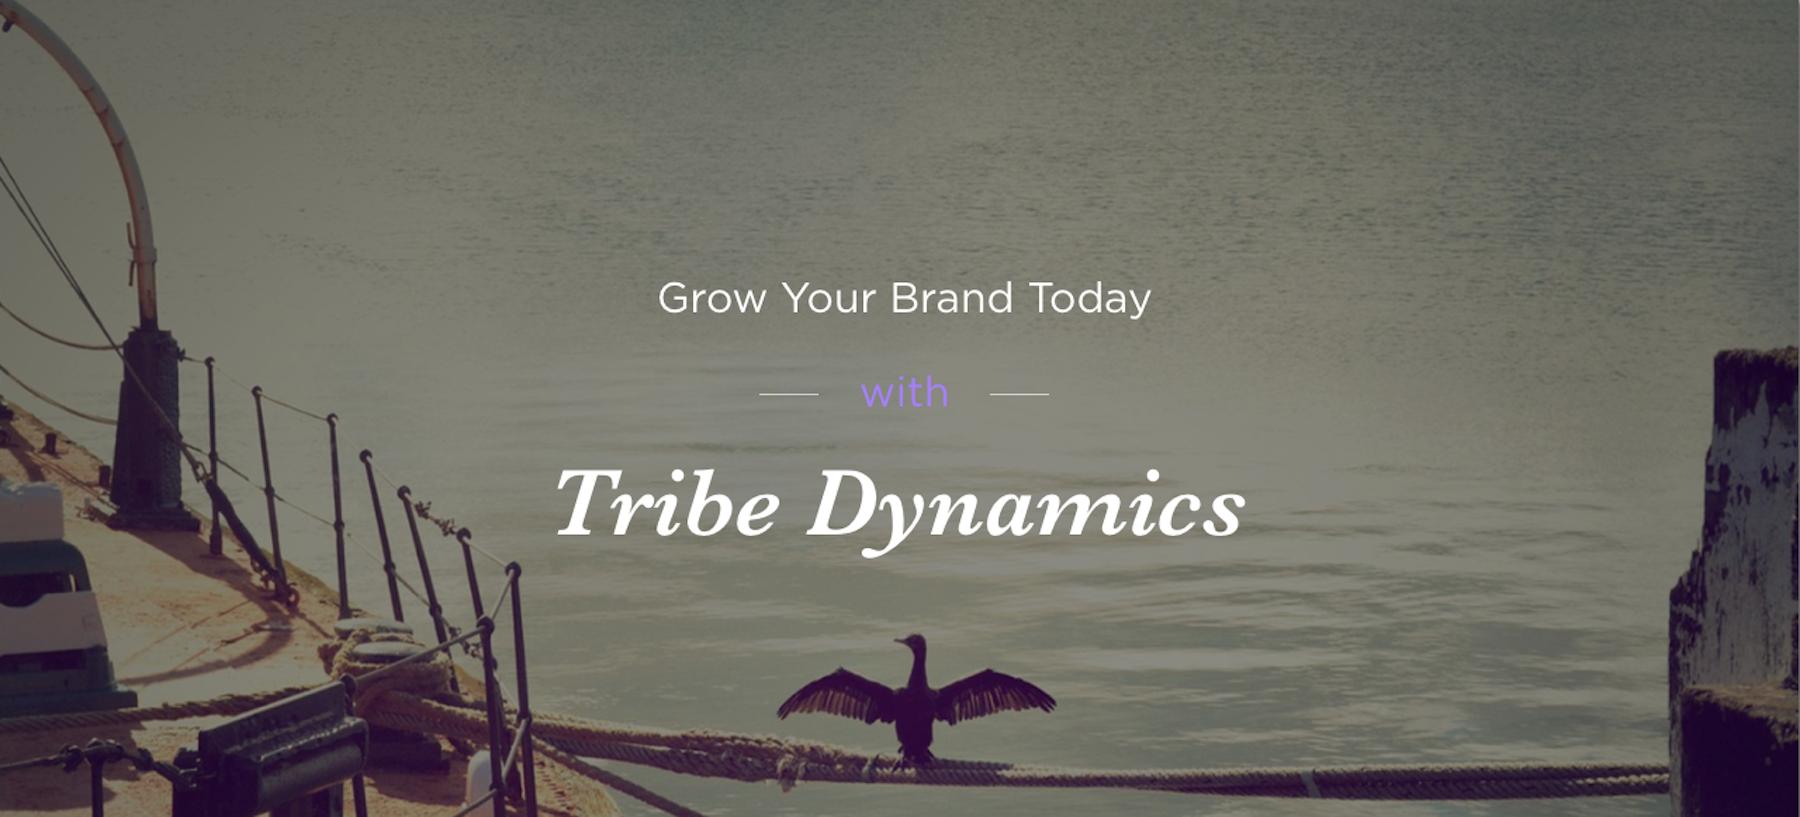 influencer-marketing-agencies